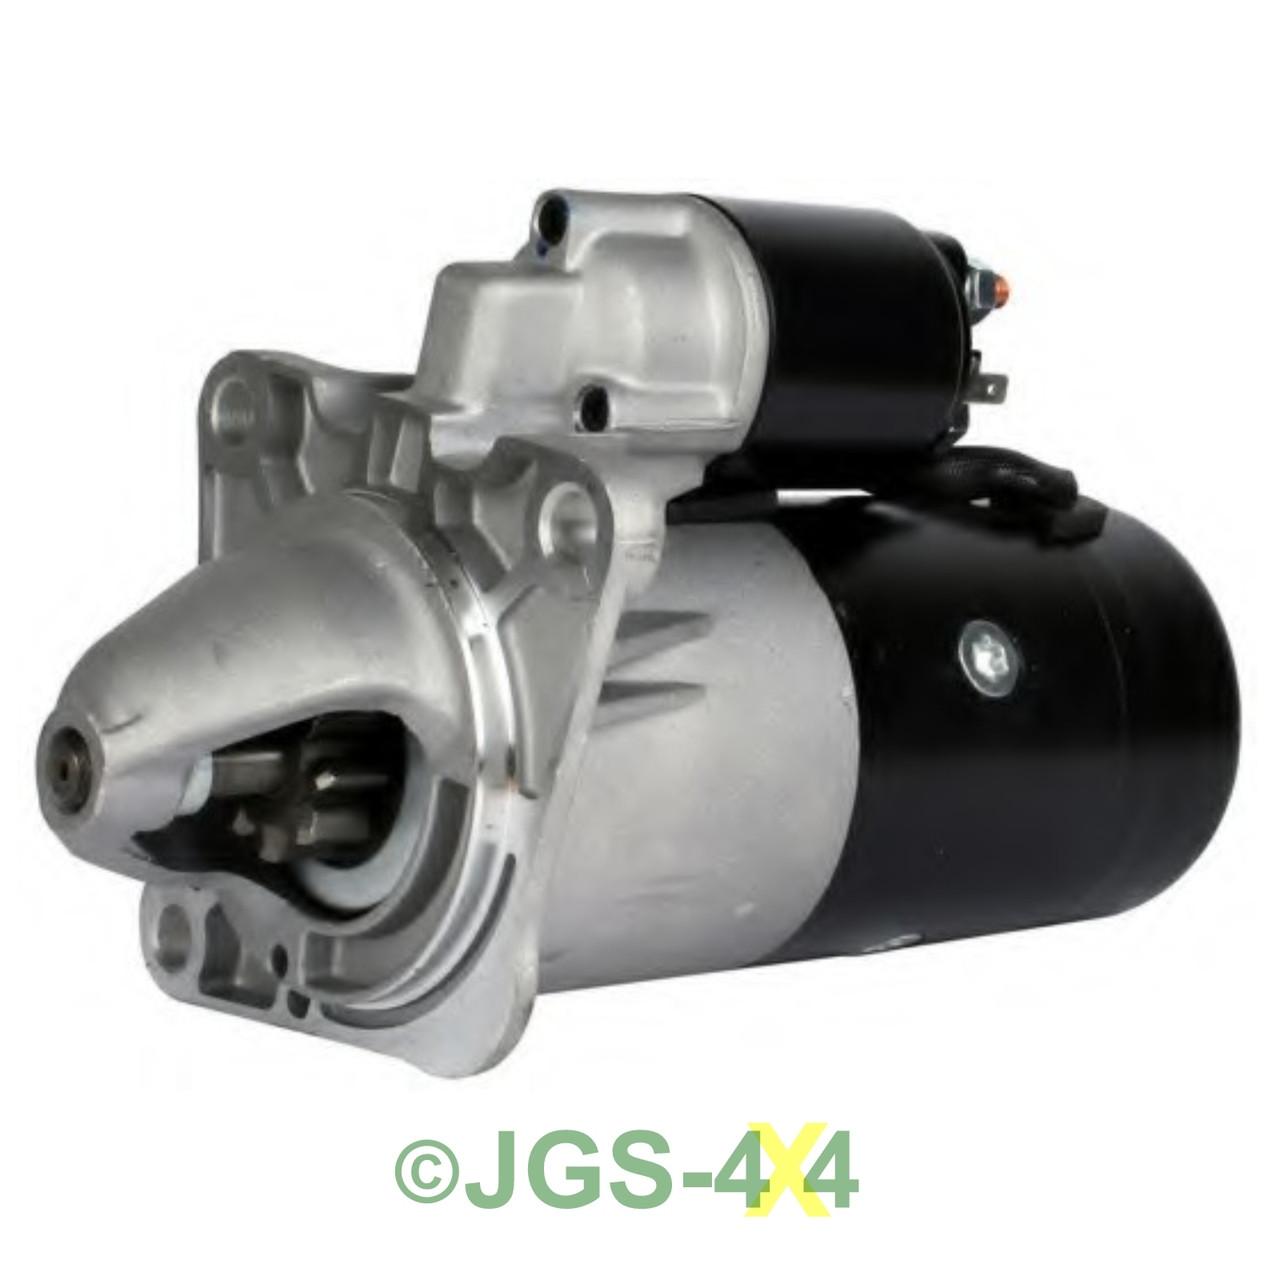 Land Rover Defender Td5 Starter Motor Removal - ▷ ▷ PowerMall